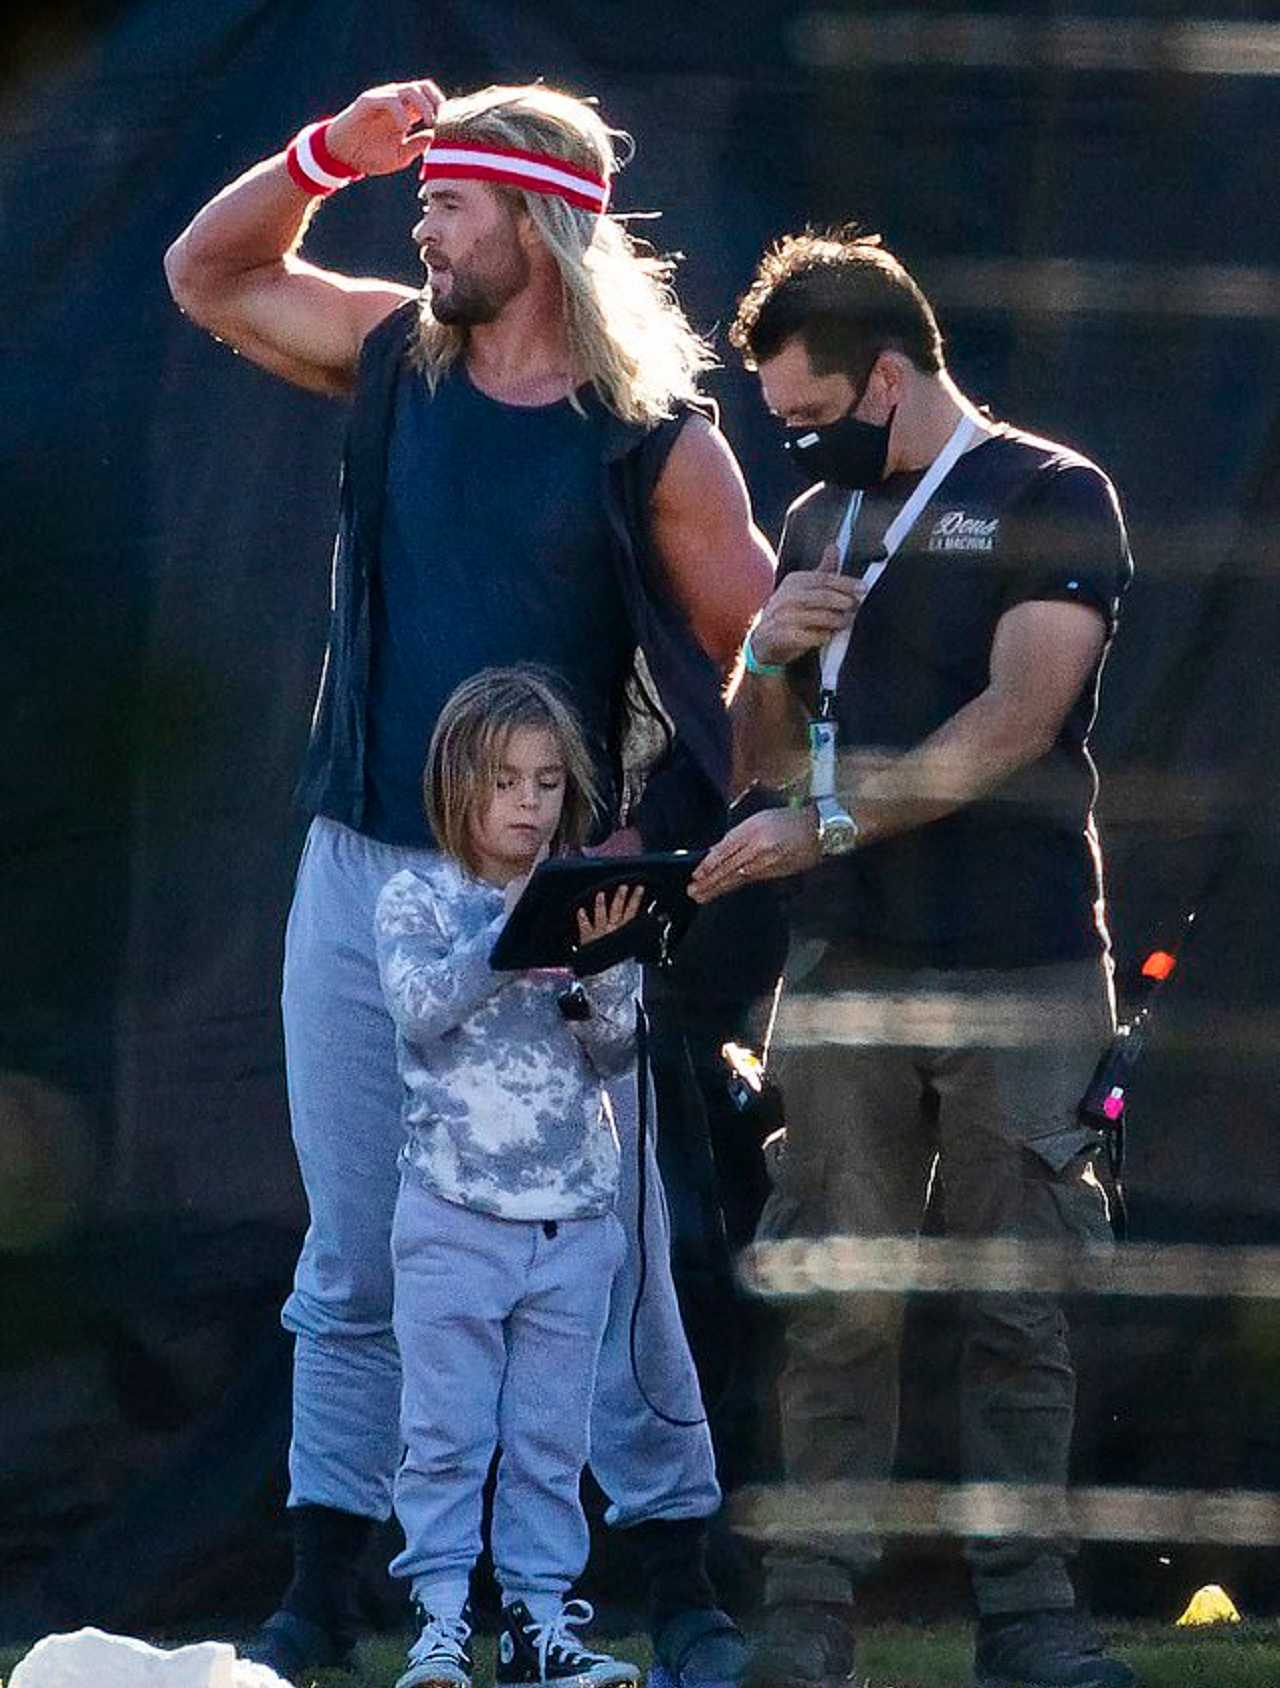 Thor 4 Chris Hemsworth Thor Love and Thunder Nuevas Imágenes